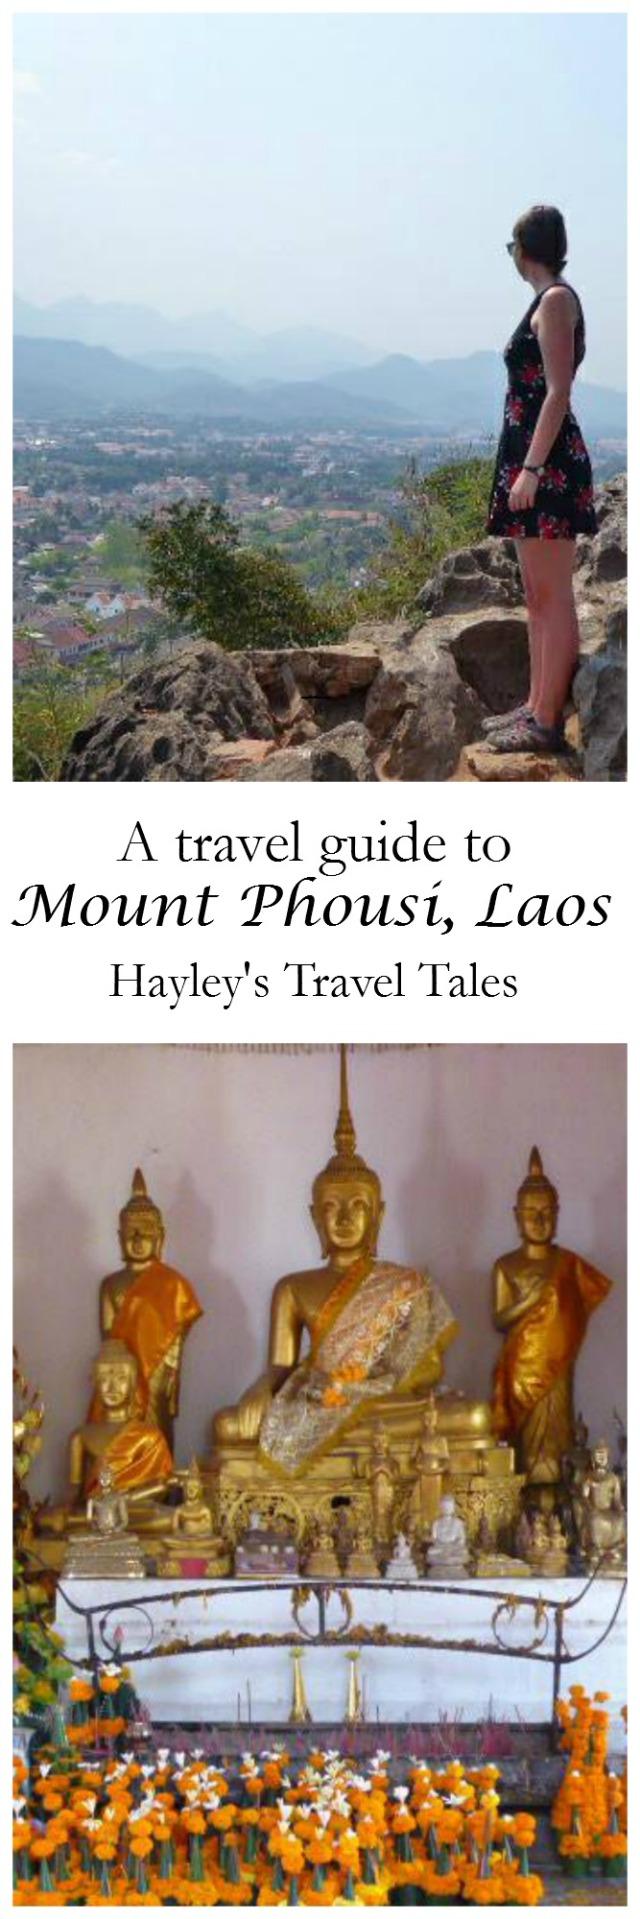 Mount Phousi travel guide